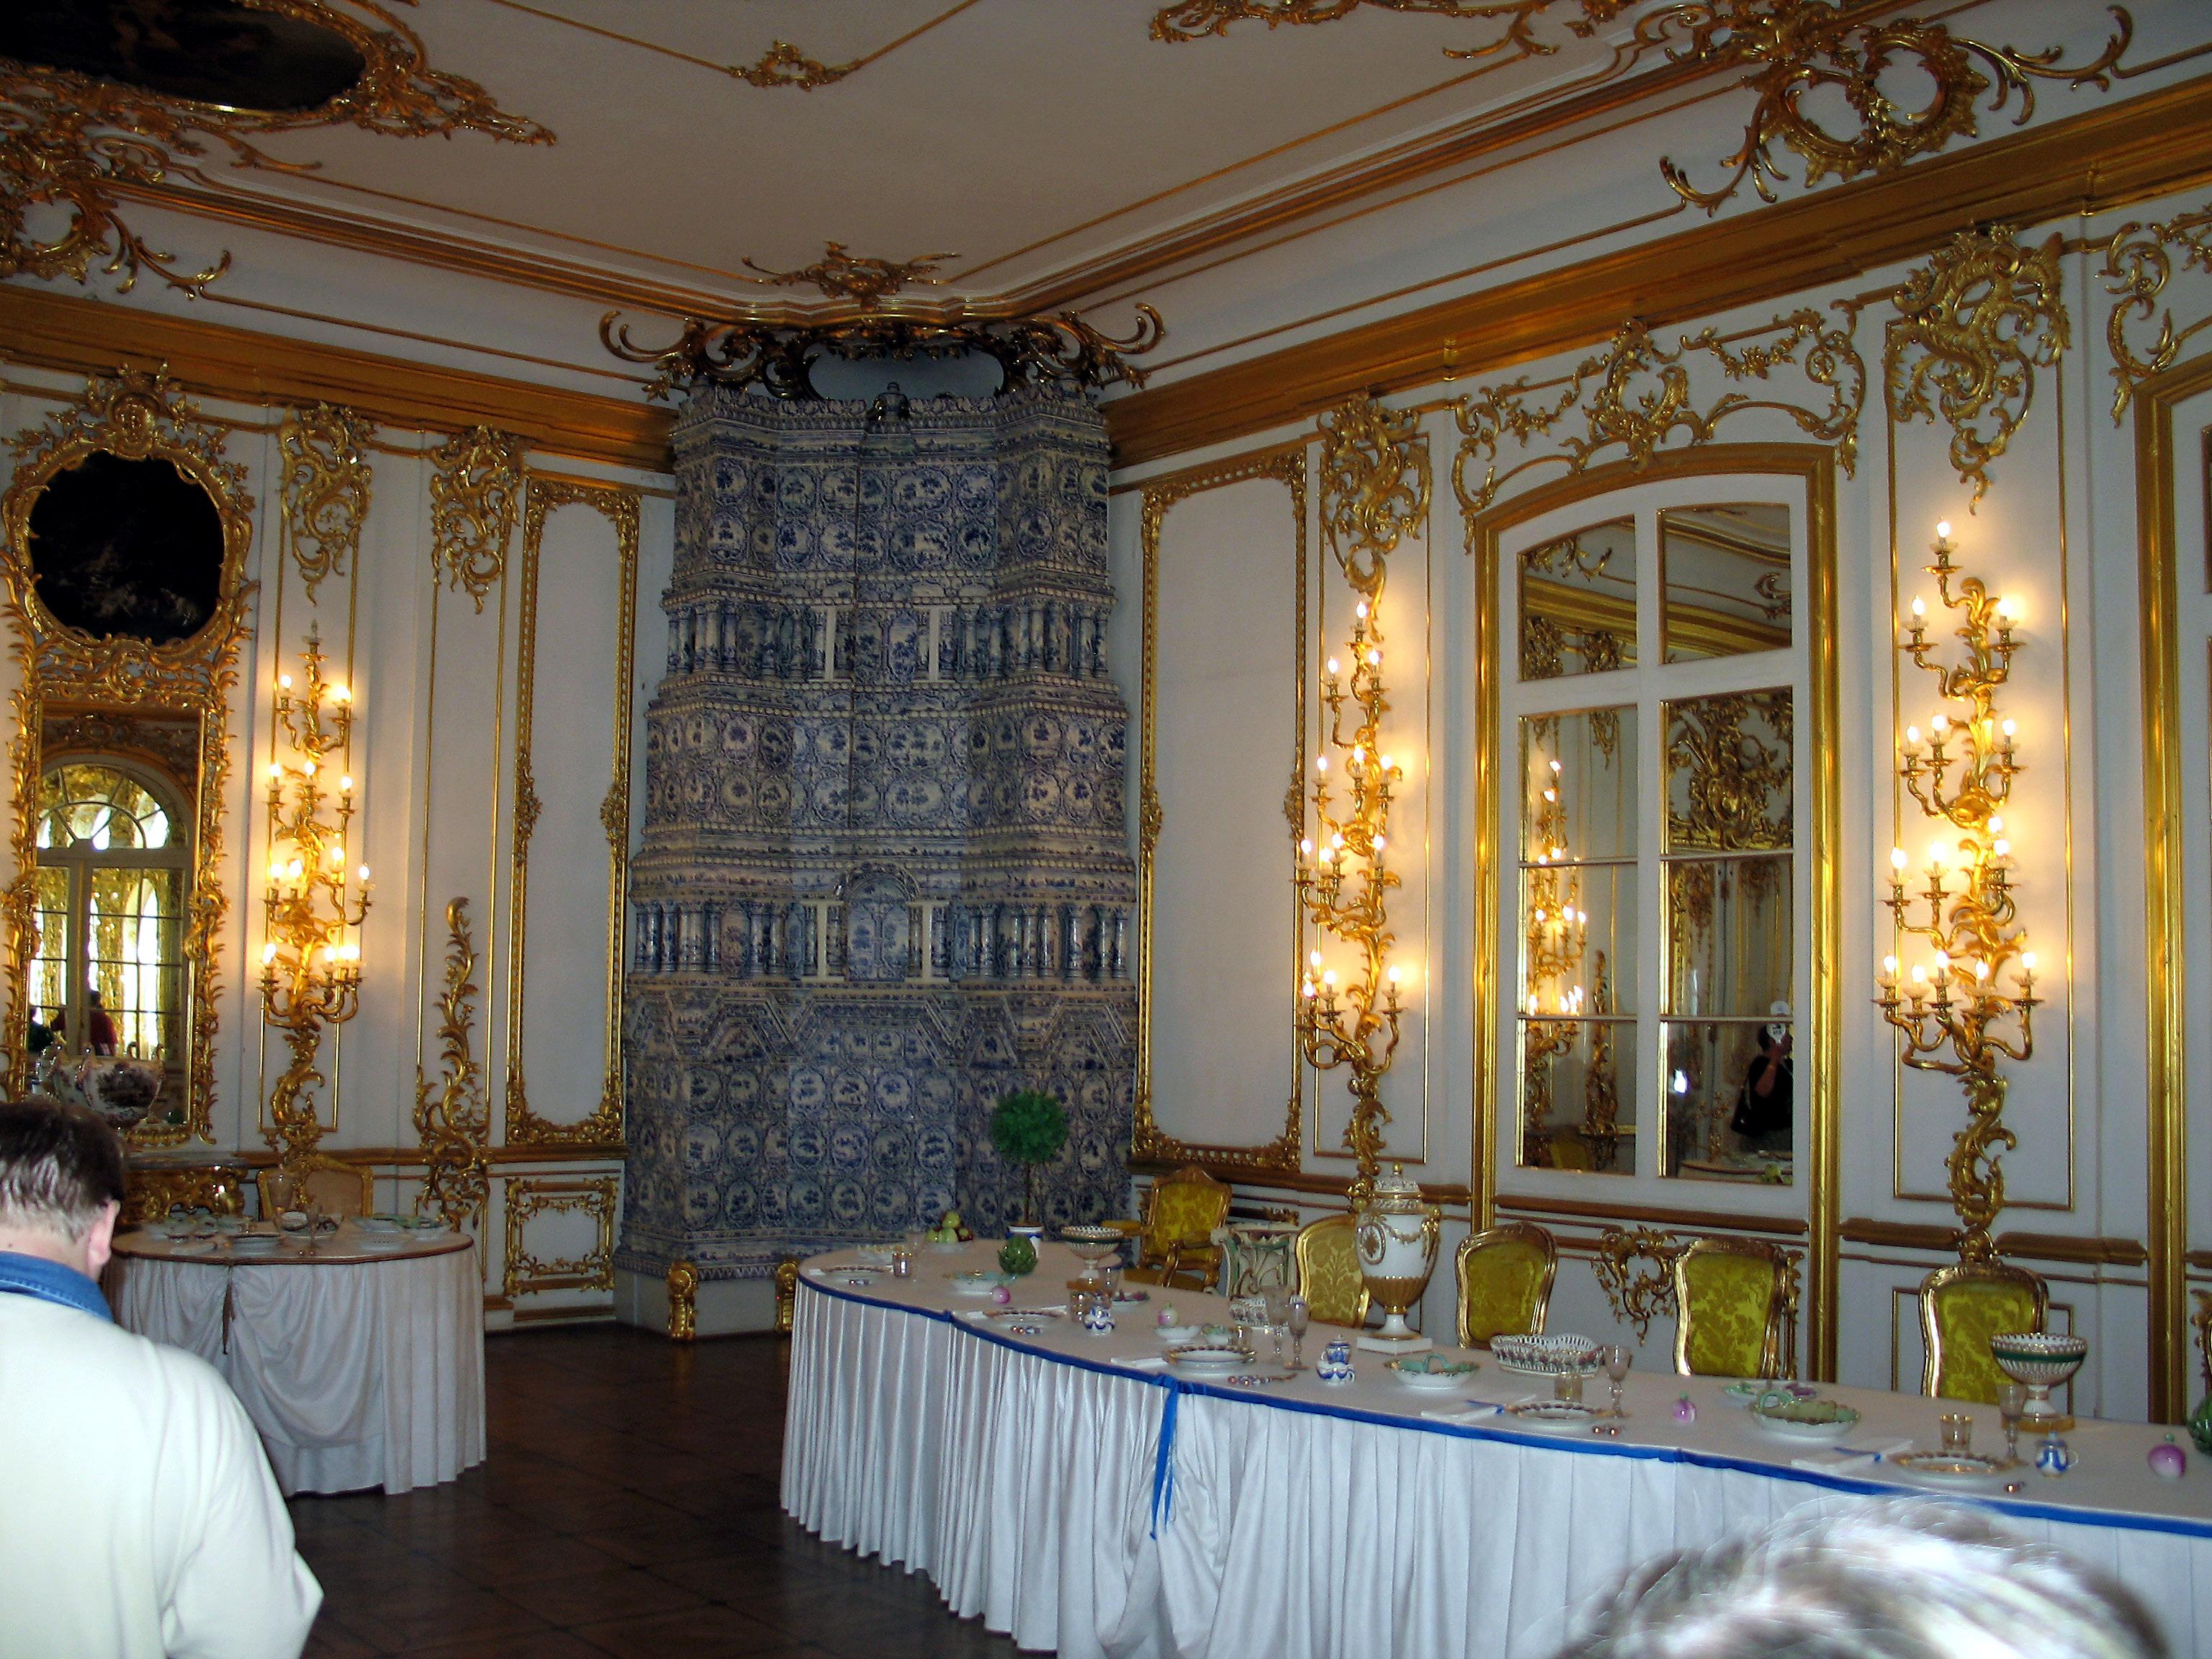 Top  gallery saki s world album helsinki fi st petersburg moscow ru july 3072 x 2304 · 1856 kB · jpeg